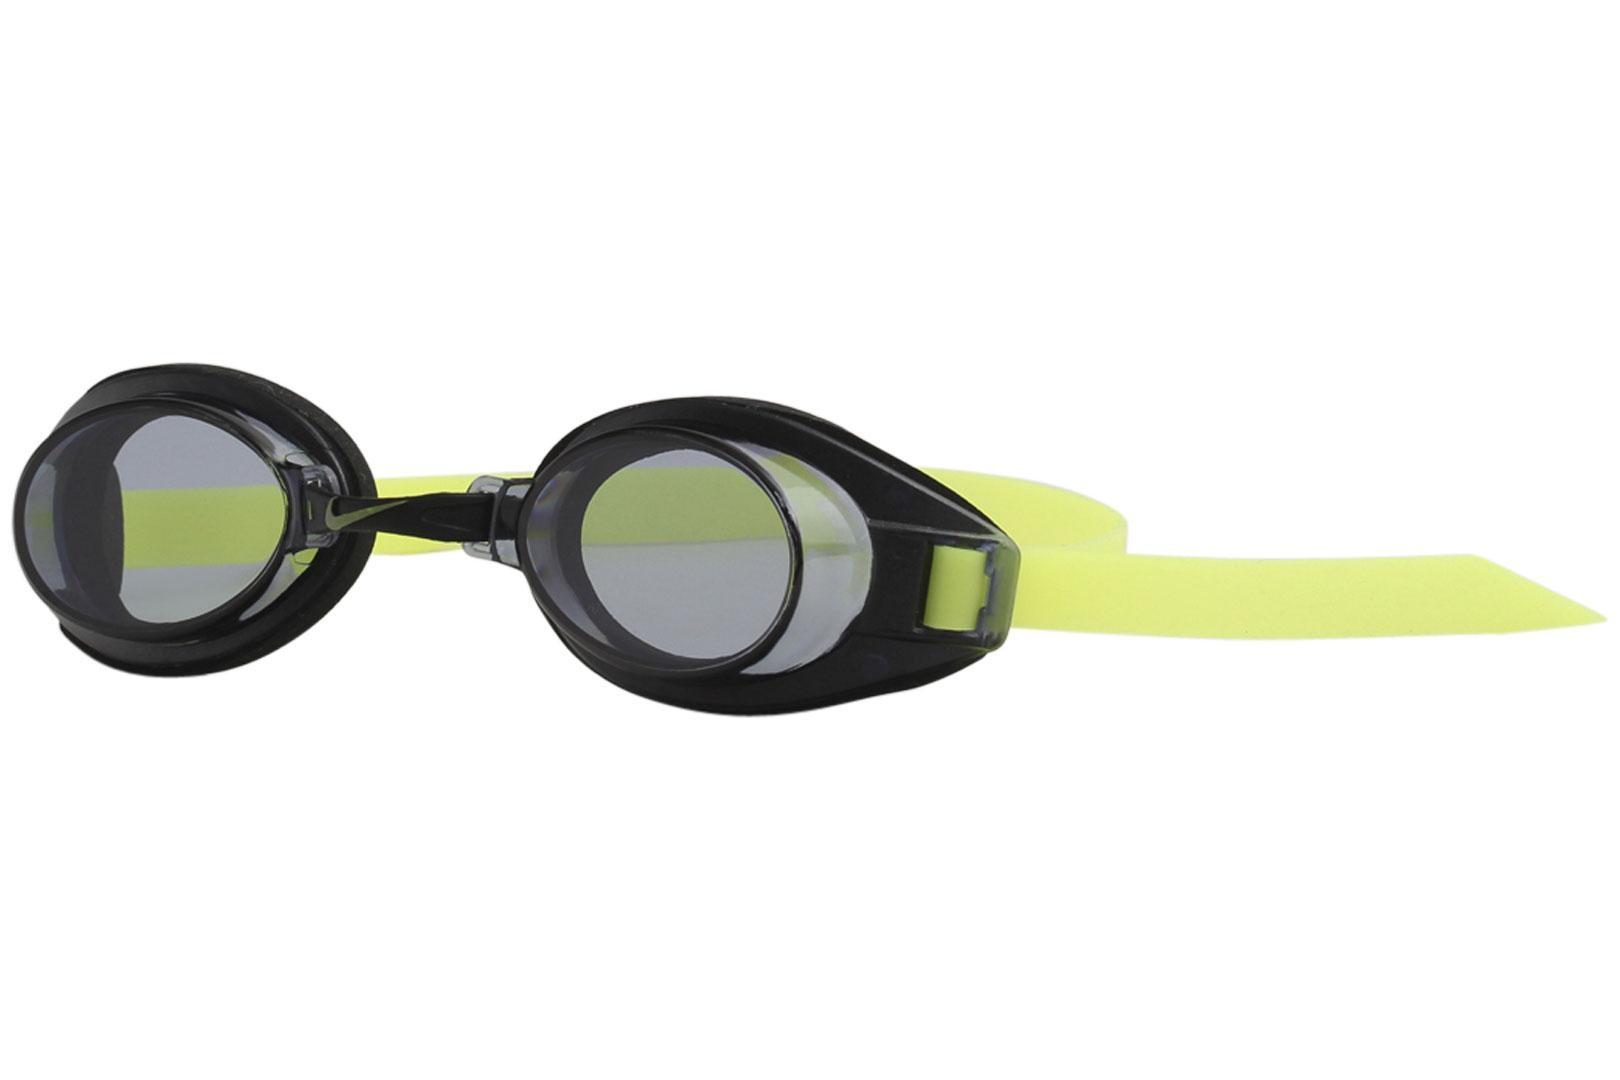 Image of Nike Men's Proto Sport Swim Goggle - Smoke 007 - One Size Fits Most